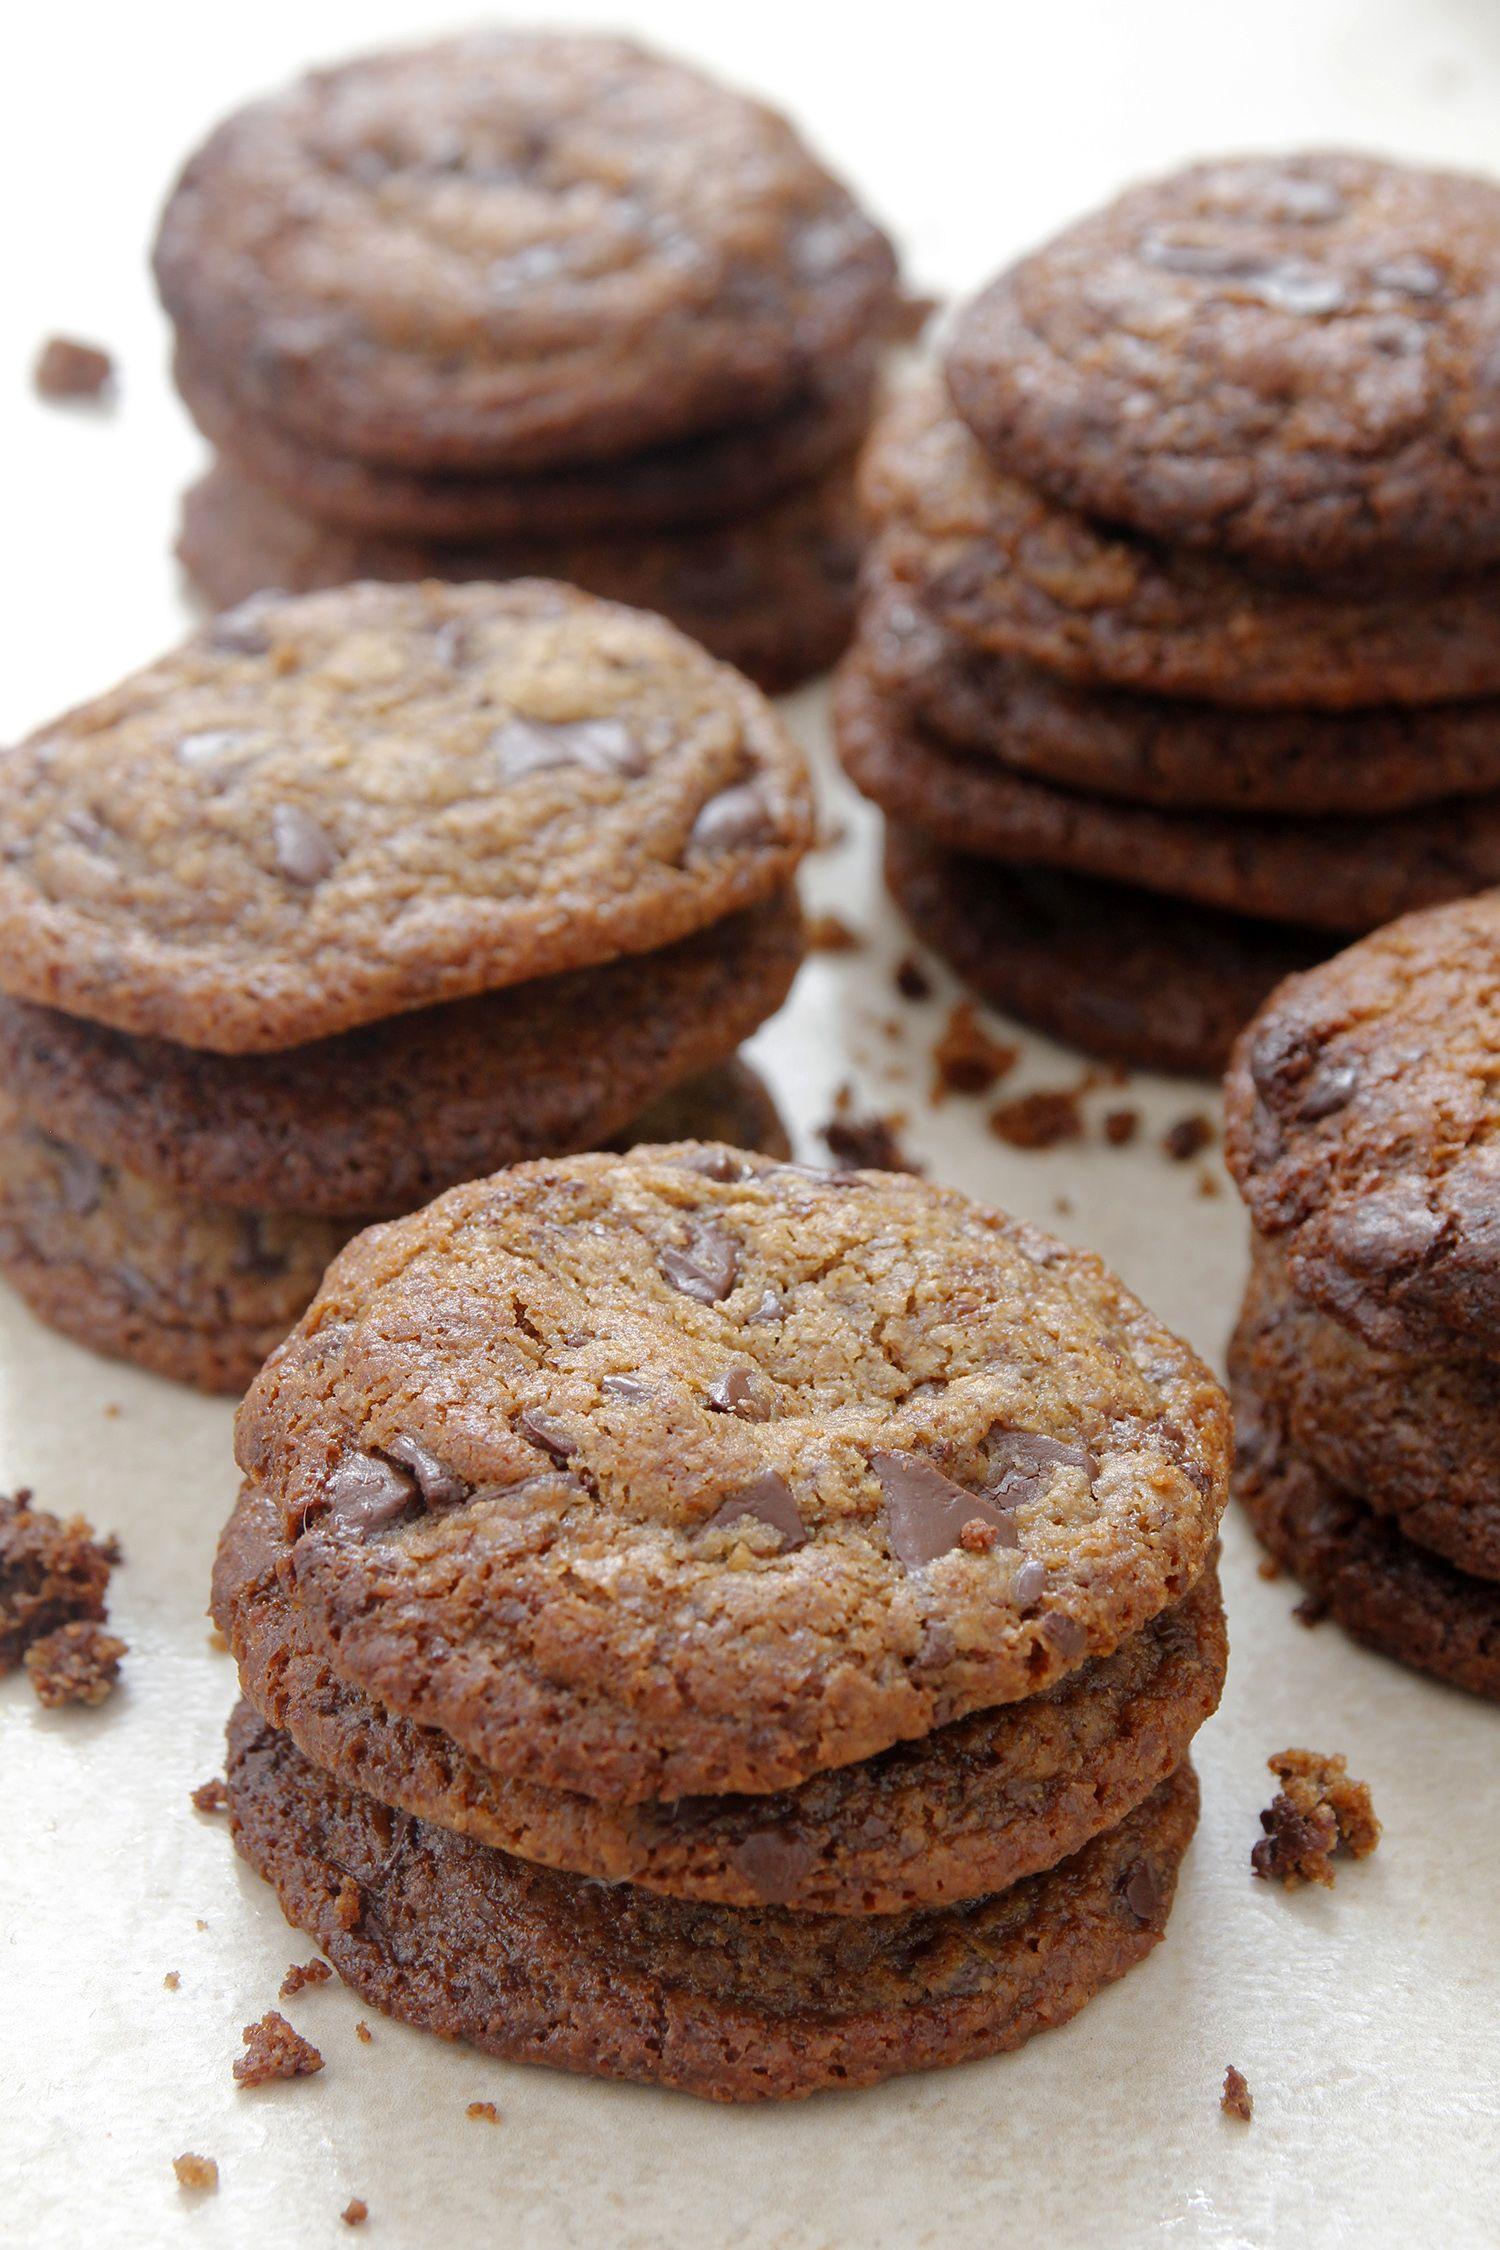 Gluten Free Chocolate Chip Cookies (Nondairy, Paleo)